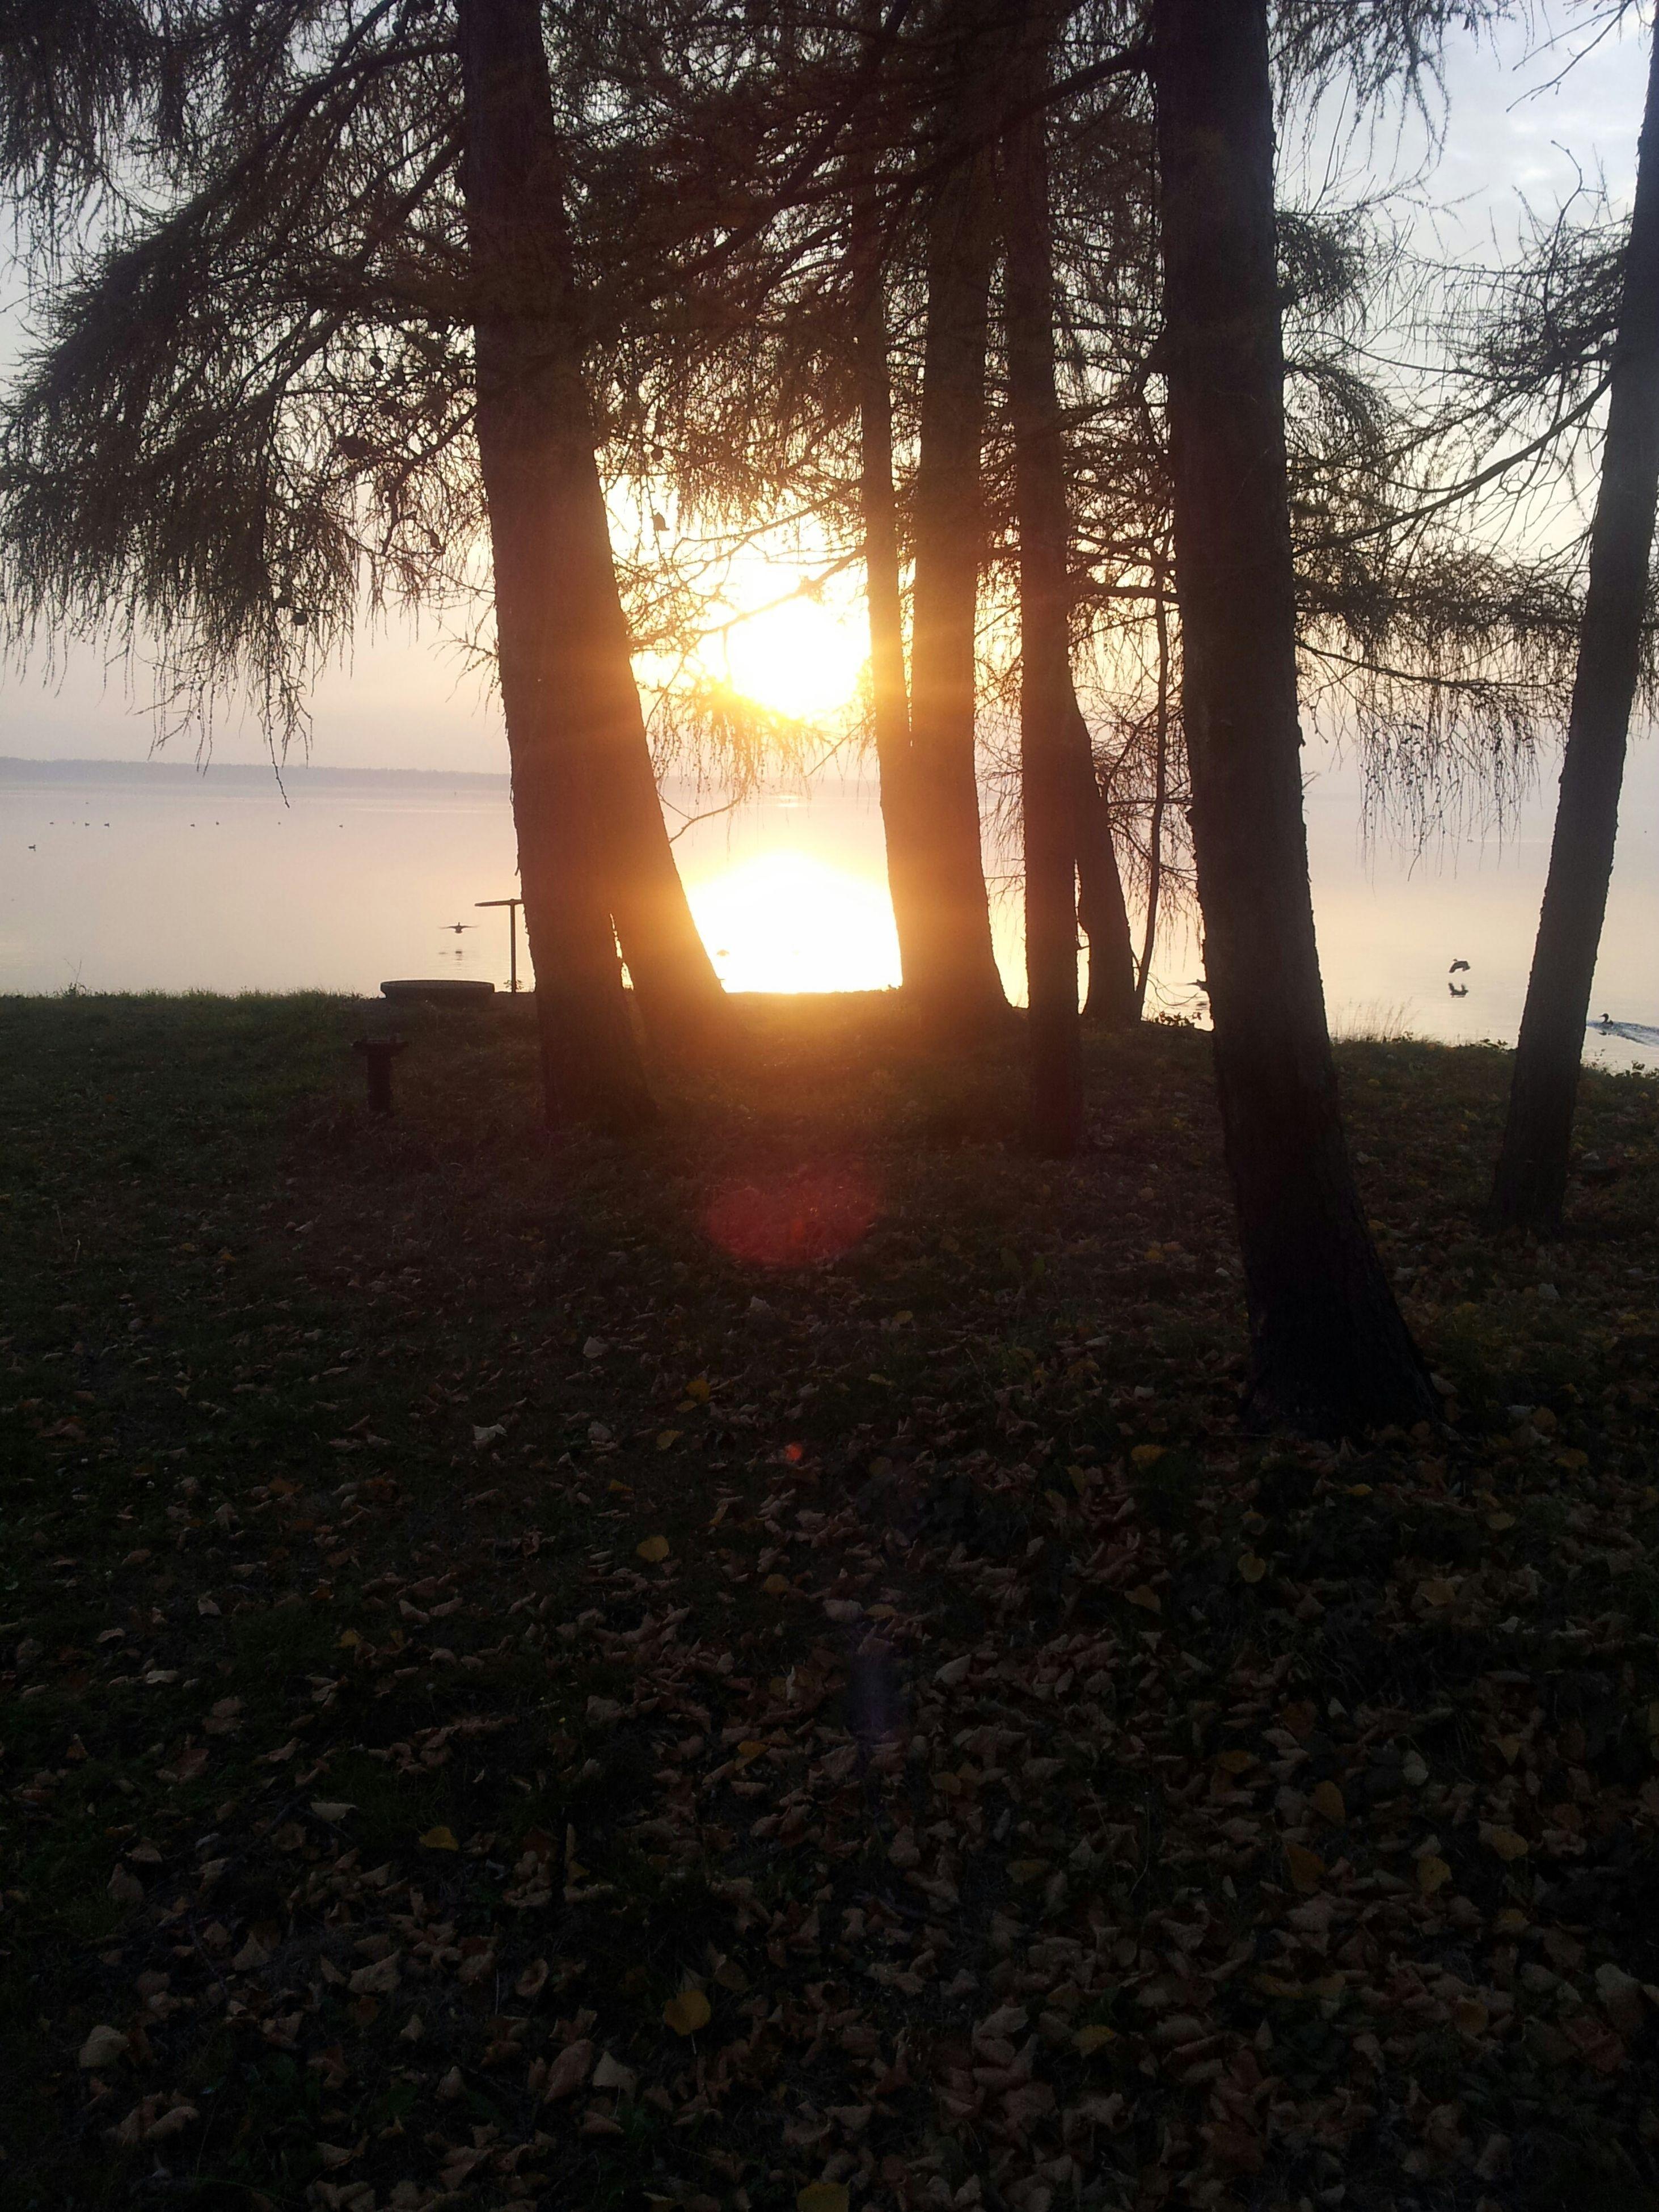 sunset, tree, sun, tranquility, tranquil scene, tree trunk, scenics, beauty in nature, sunlight, nature, silhouette, landscape, orange color, growth, idyllic, non-urban scene, field, sky, forest, sunbeam